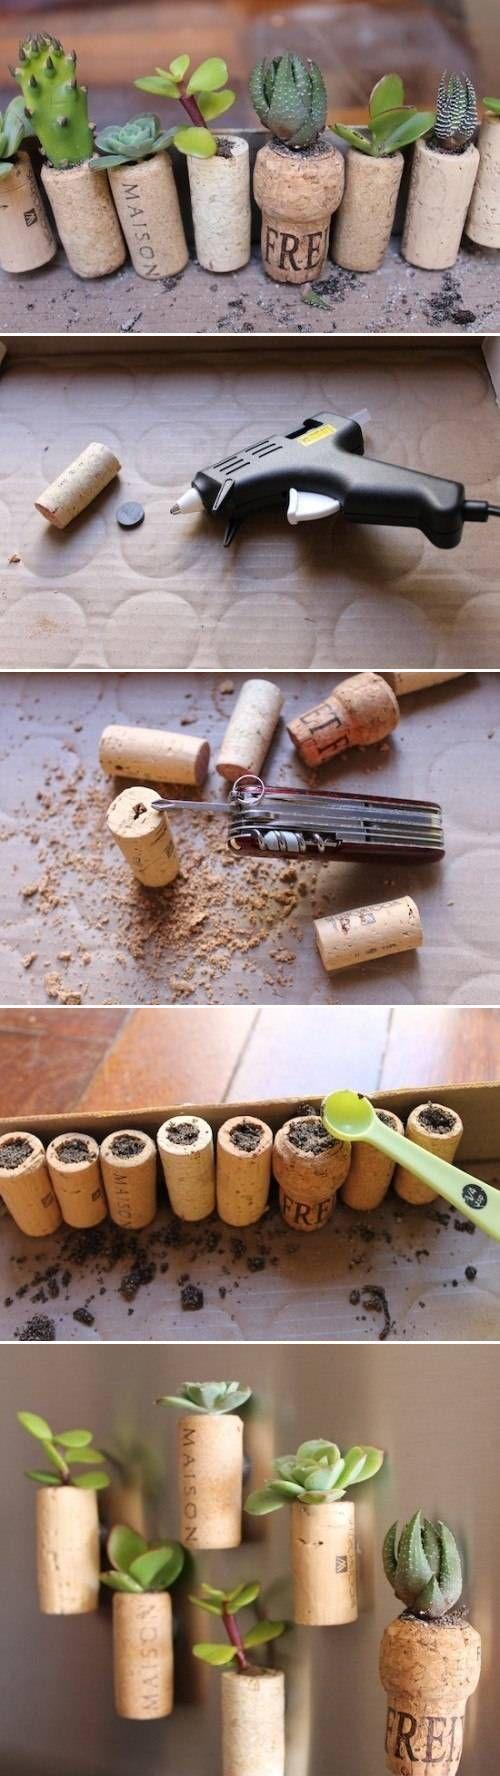 DIY Wine Cork Garden DIY Projects